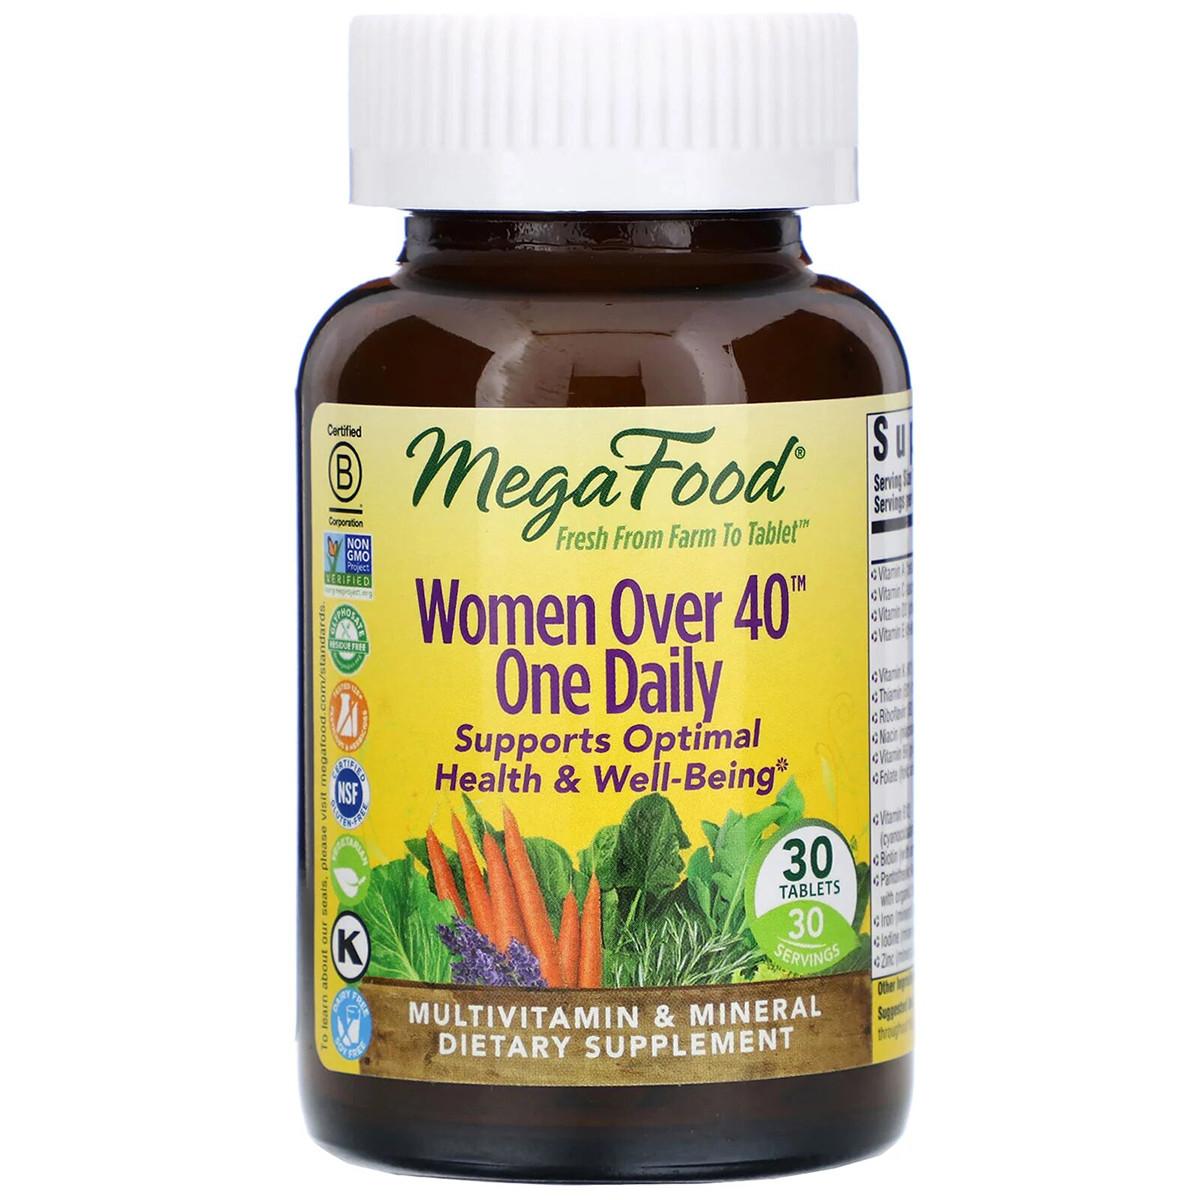 Мультивитамины для женщин 40+, Women Over 40 One Daily, MegaFood, 30 таблеток